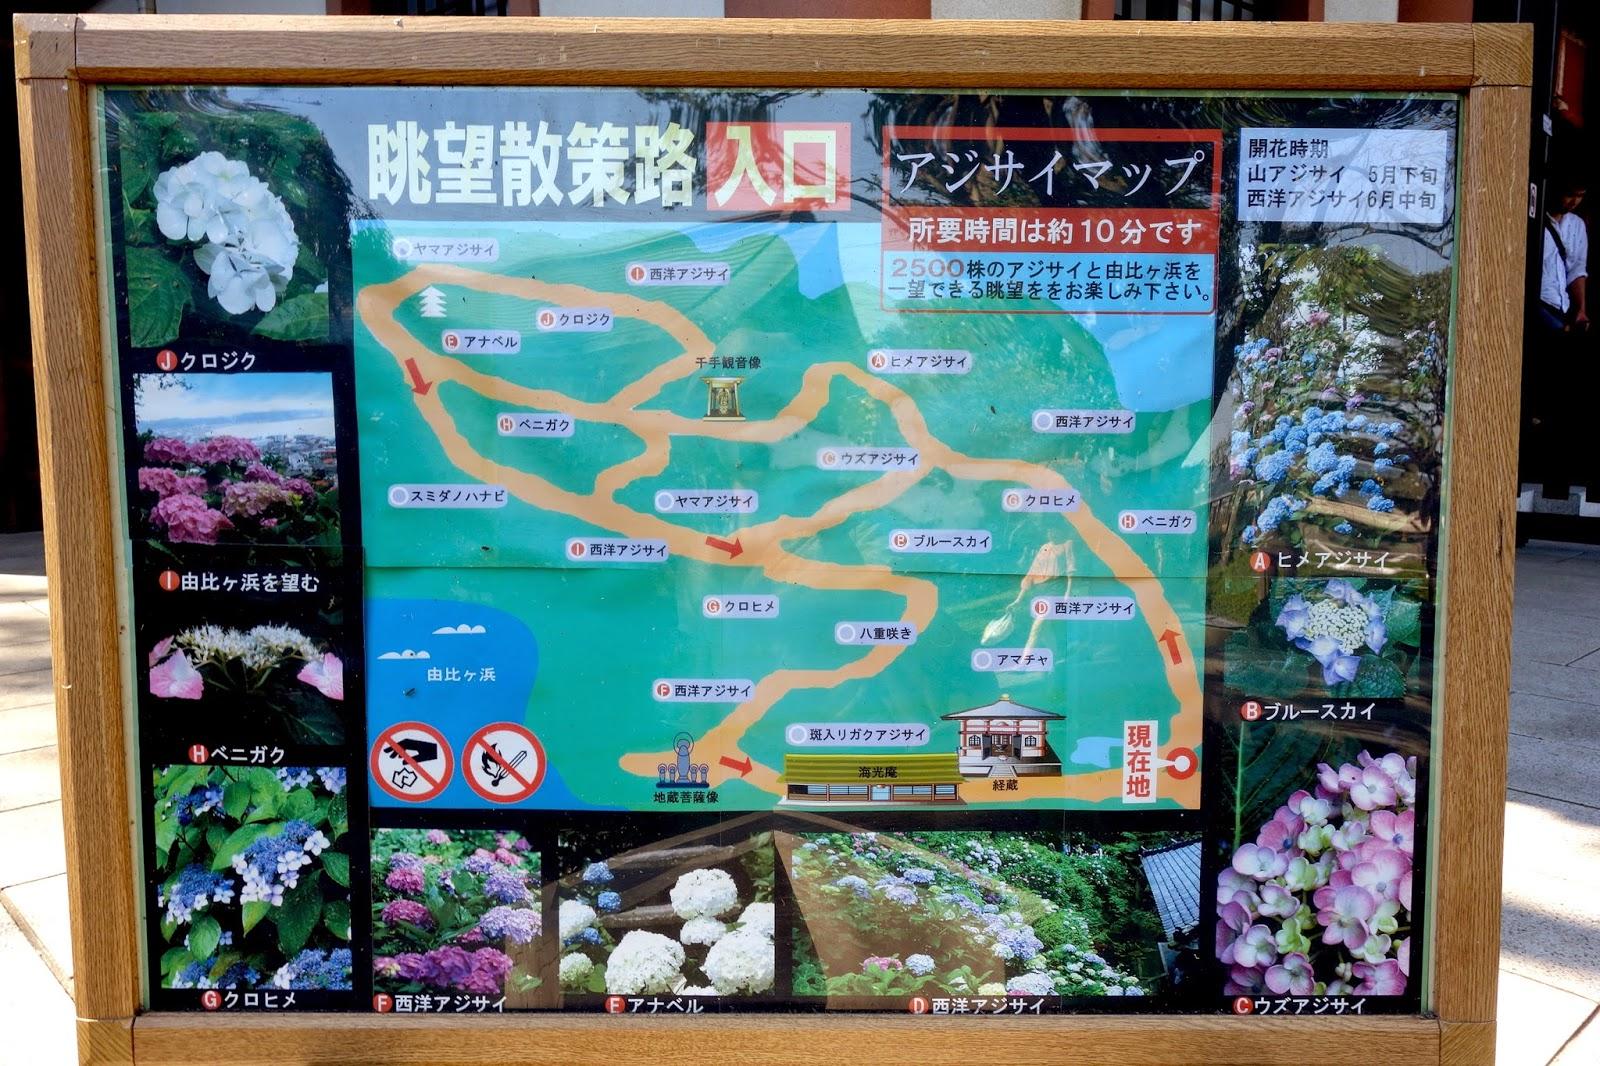 Hasedera 長谷寺 temple Hase Temple kamakura japan tour tripajisai hydrangea